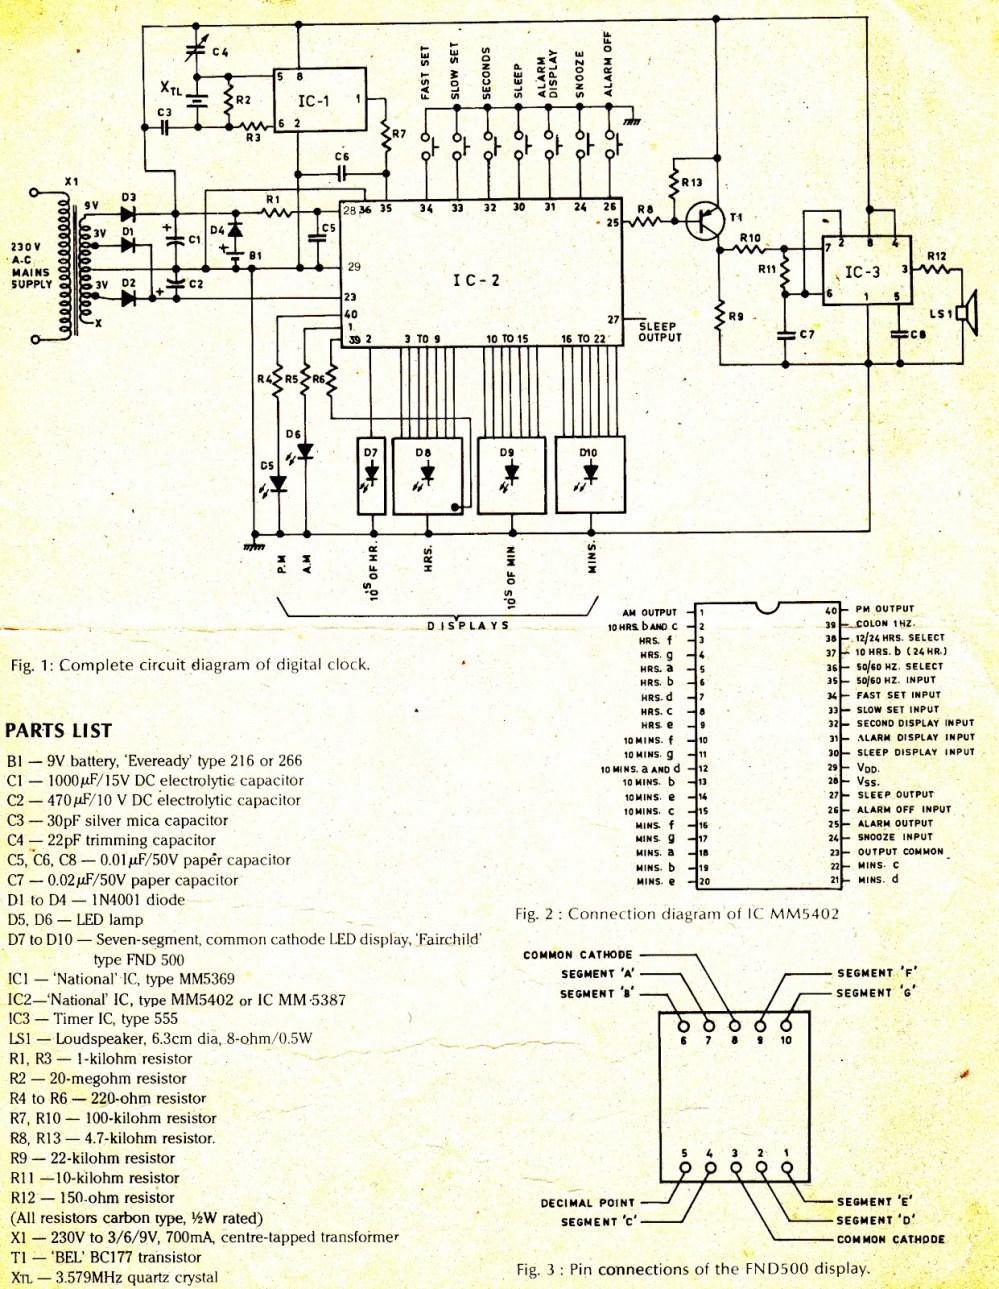 medium resolution of digital clock under repository circuits 24852 next gr led running light circuit diagram foto artis candydoll